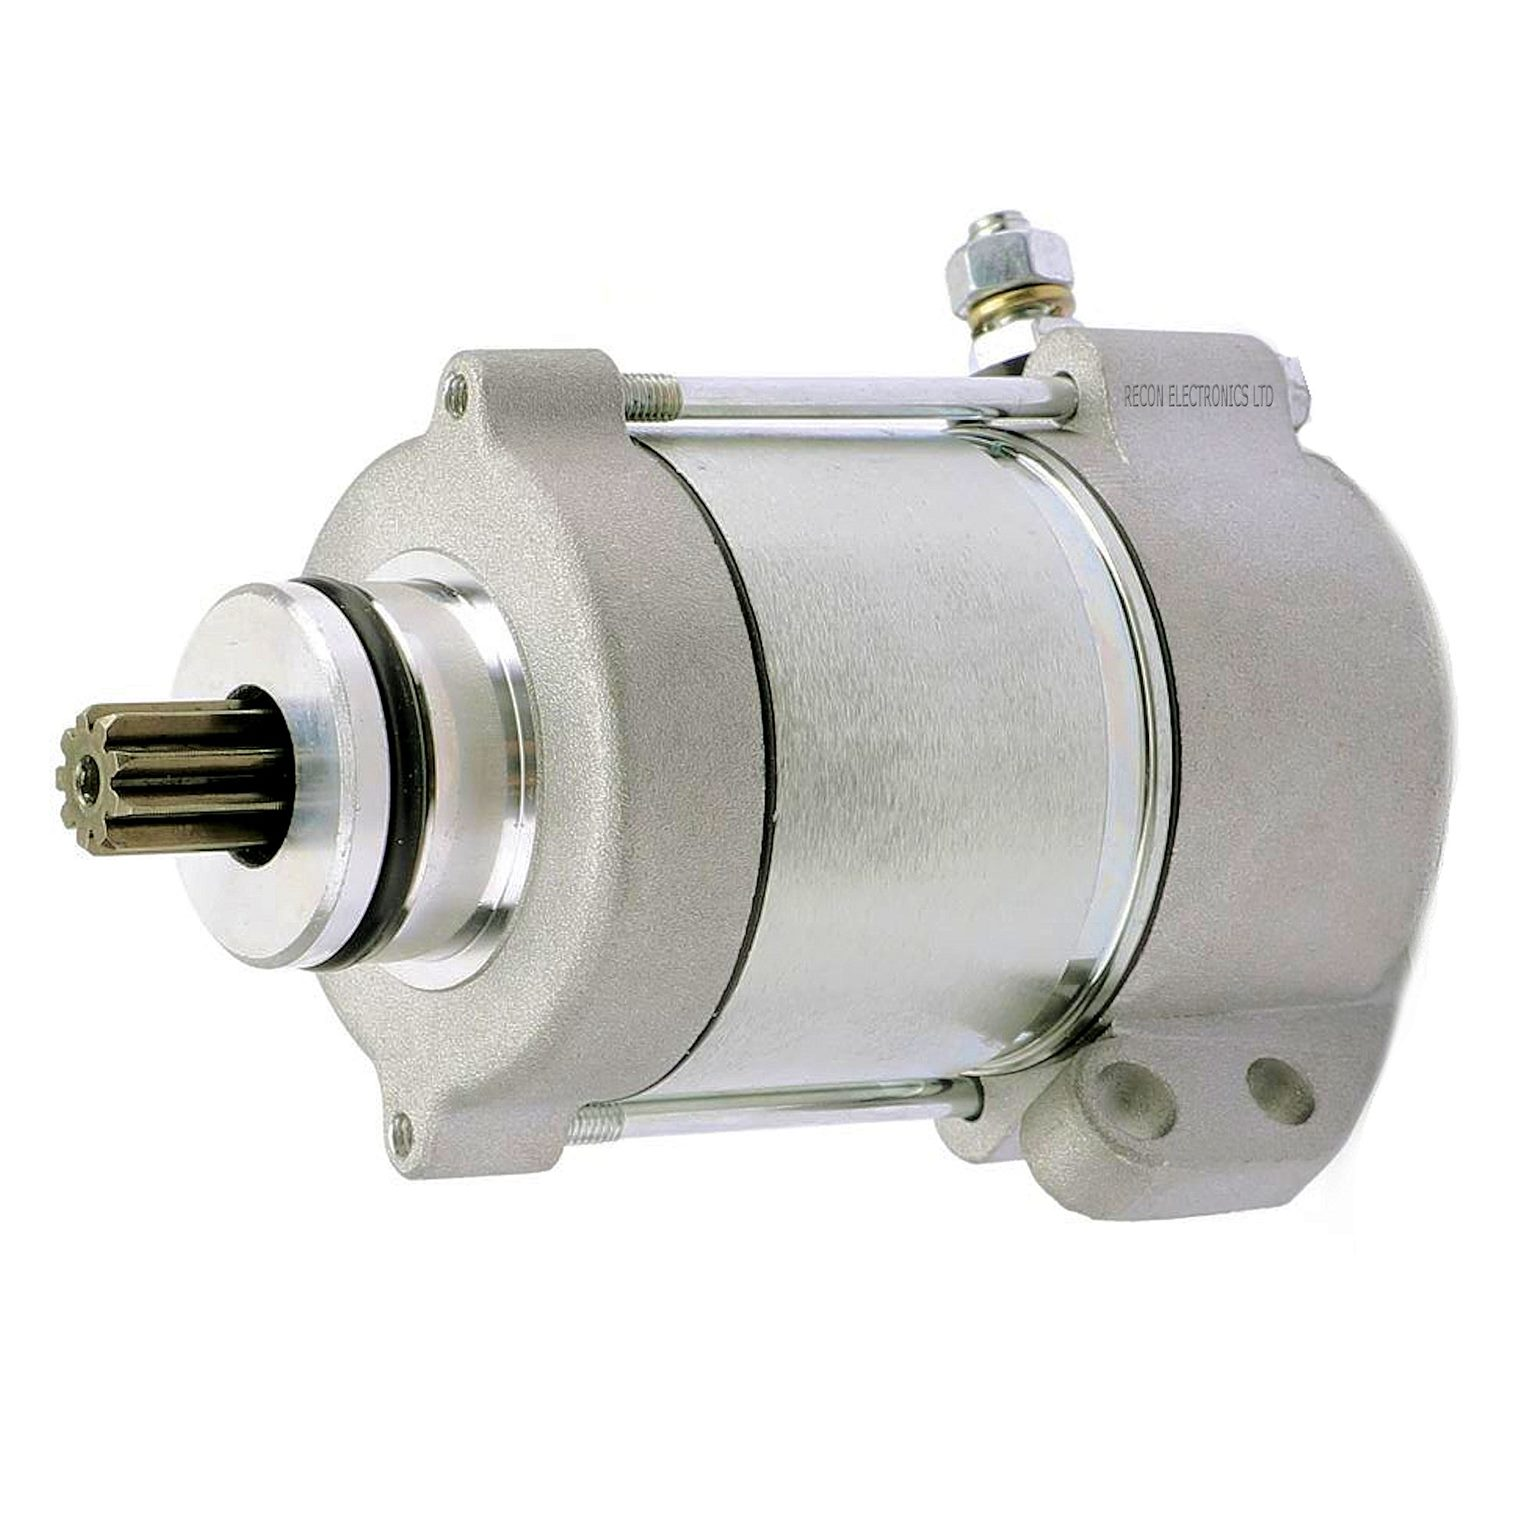 KTM - High-Quality 410 Watt Starter Motor, Fits Many Models